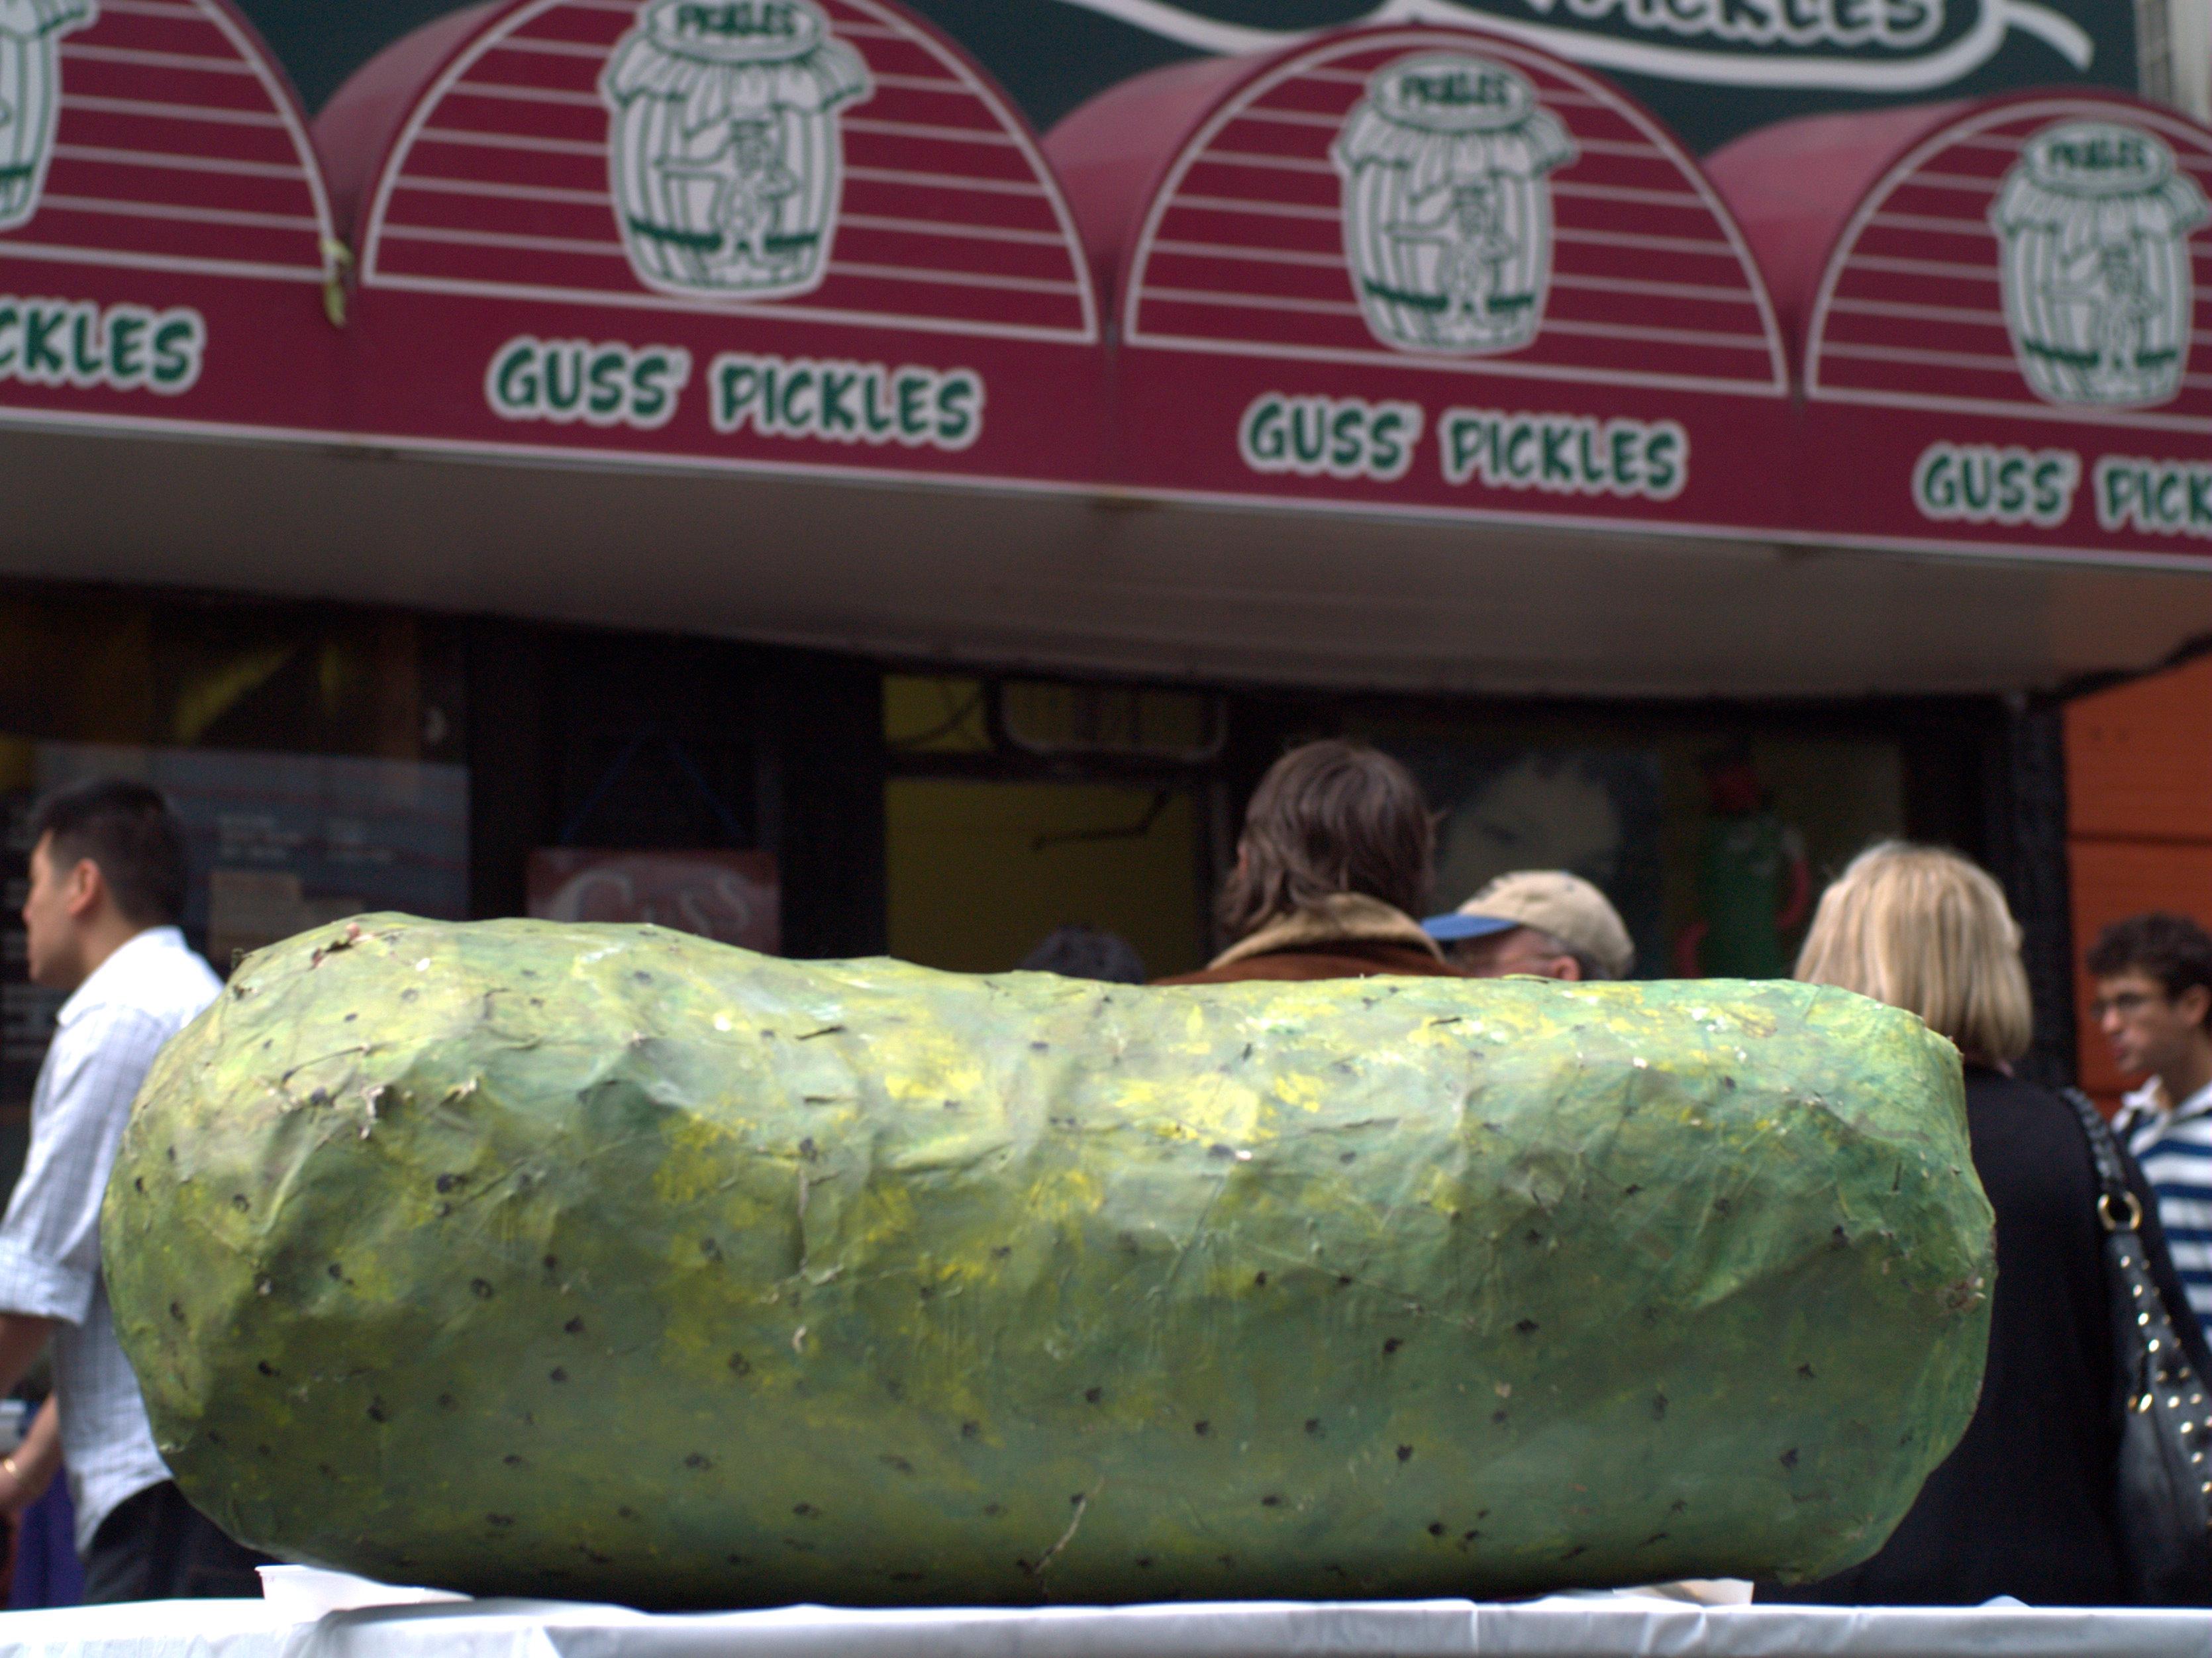 International Pickle Day